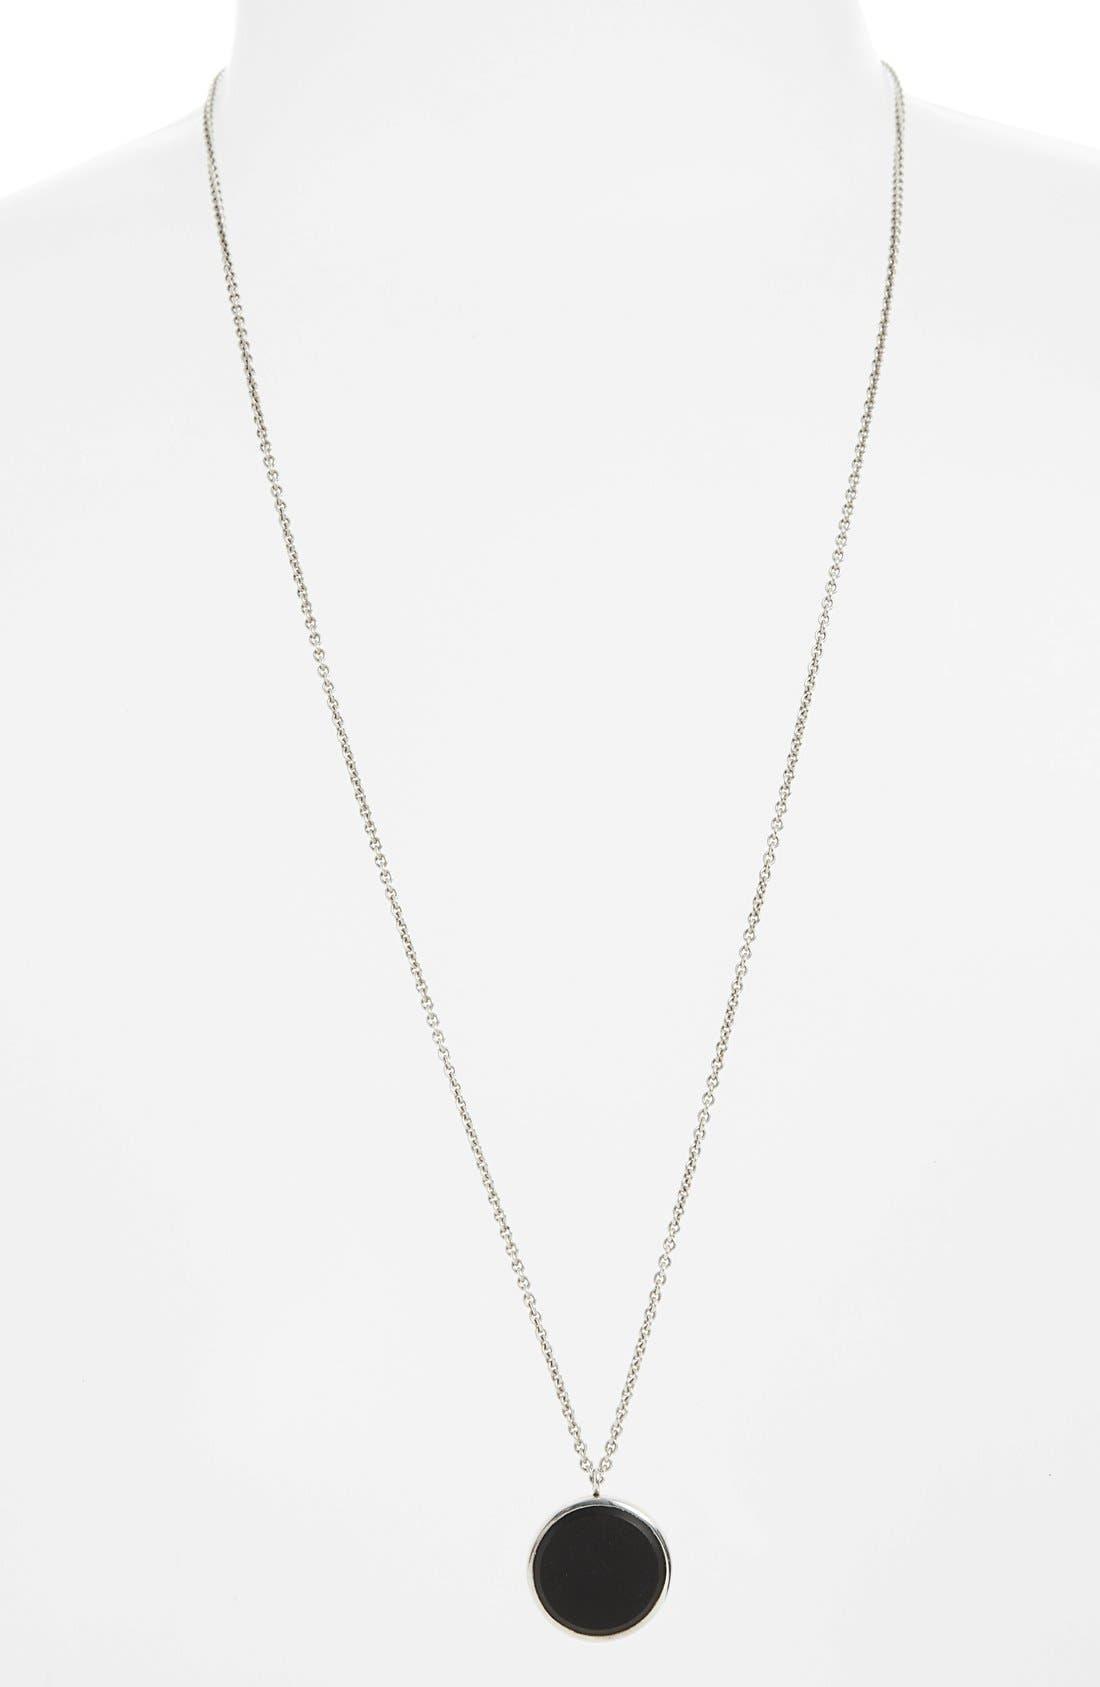 Black Onyx Medallion Necklace,                             Alternate thumbnail 3, color,                             SILVER